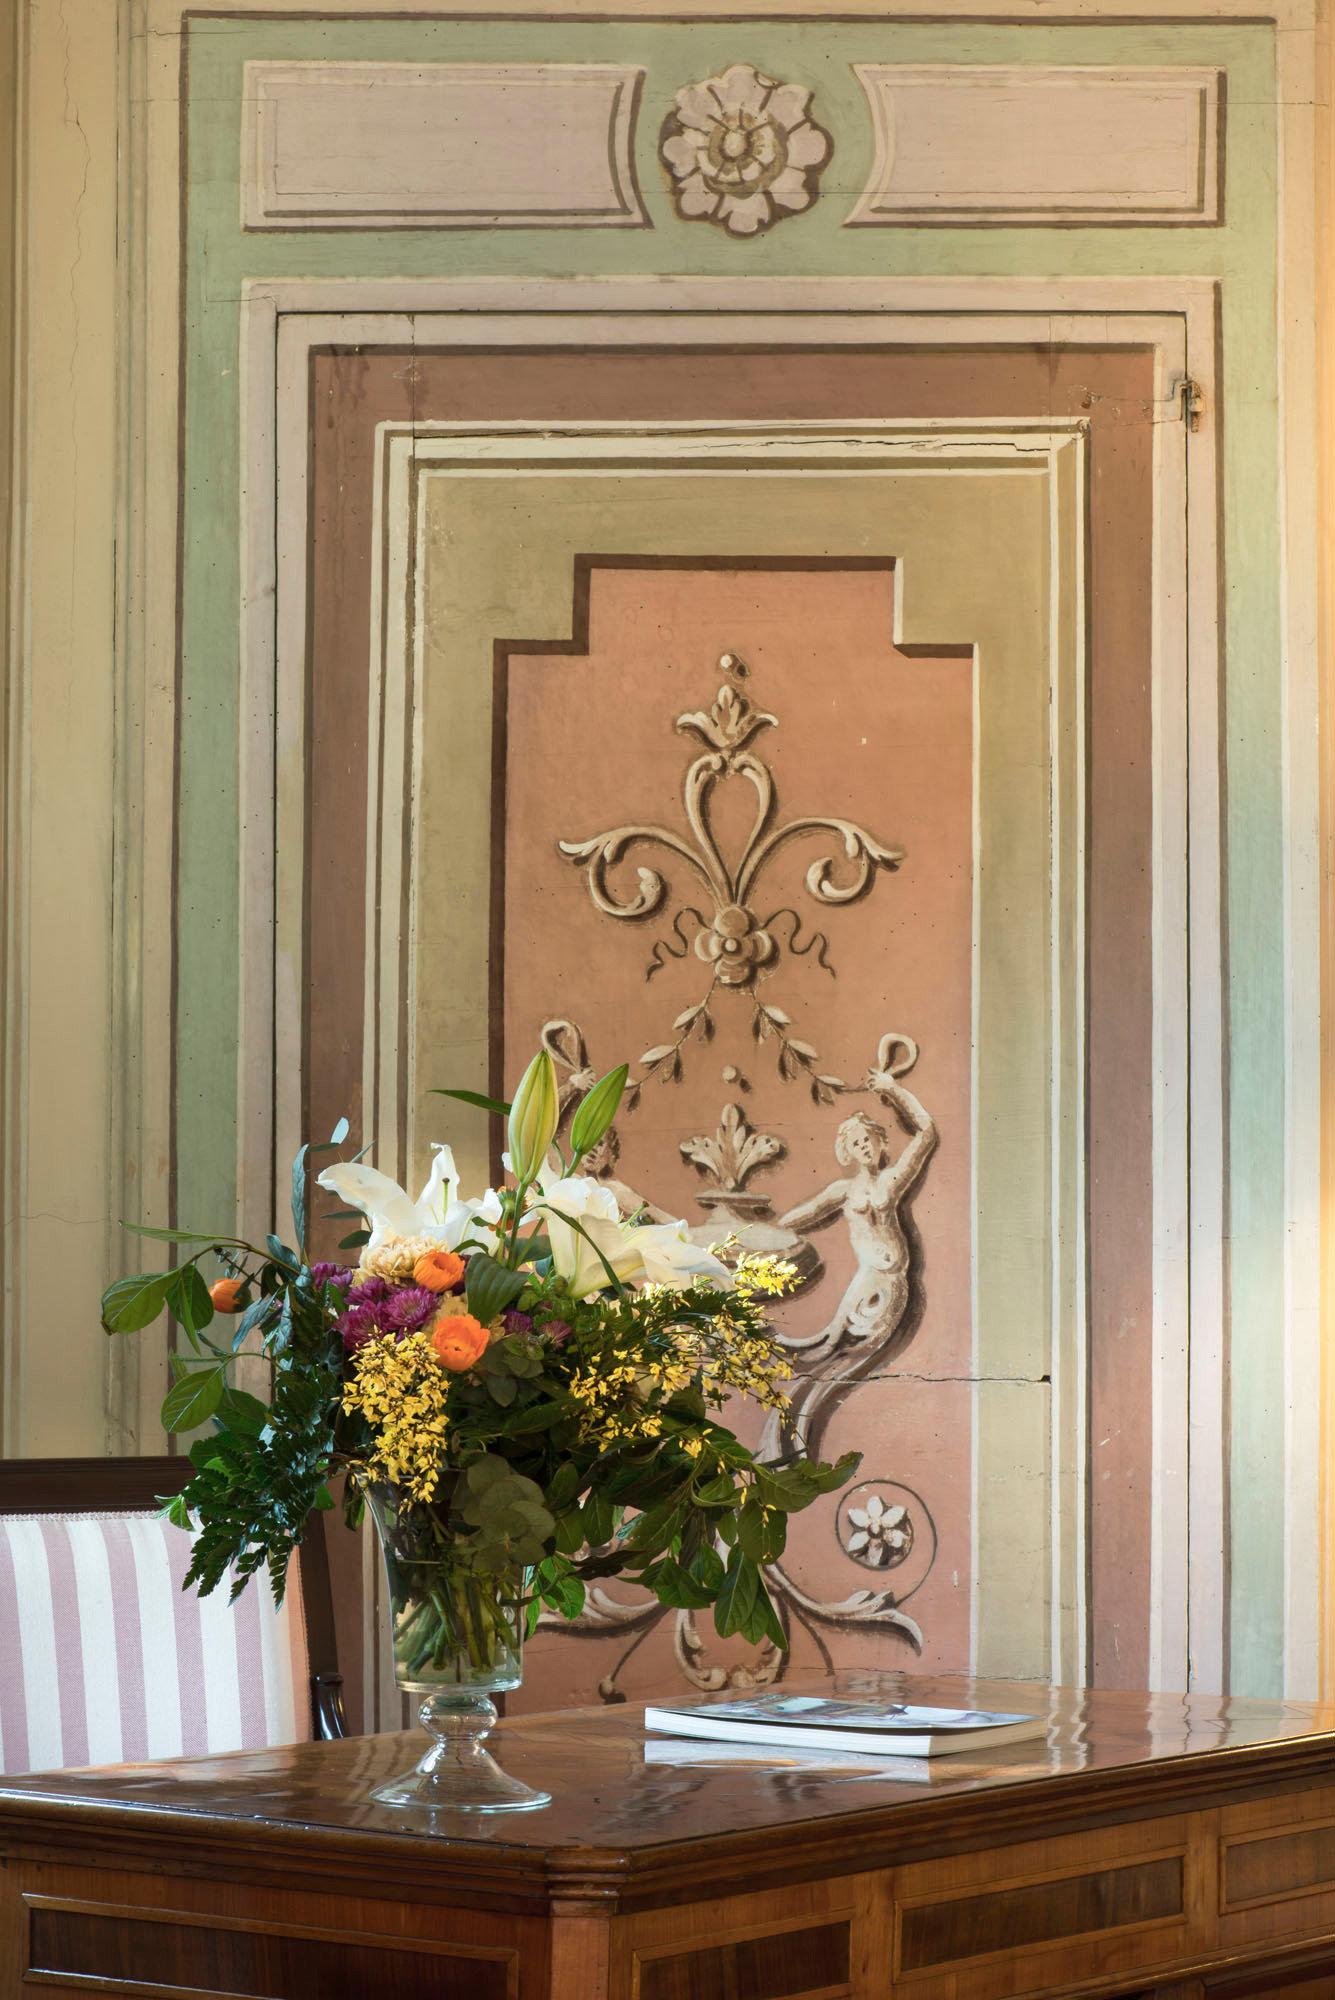 Country Cultural Elegant Historic building flower altar floristry art door plant picture frame